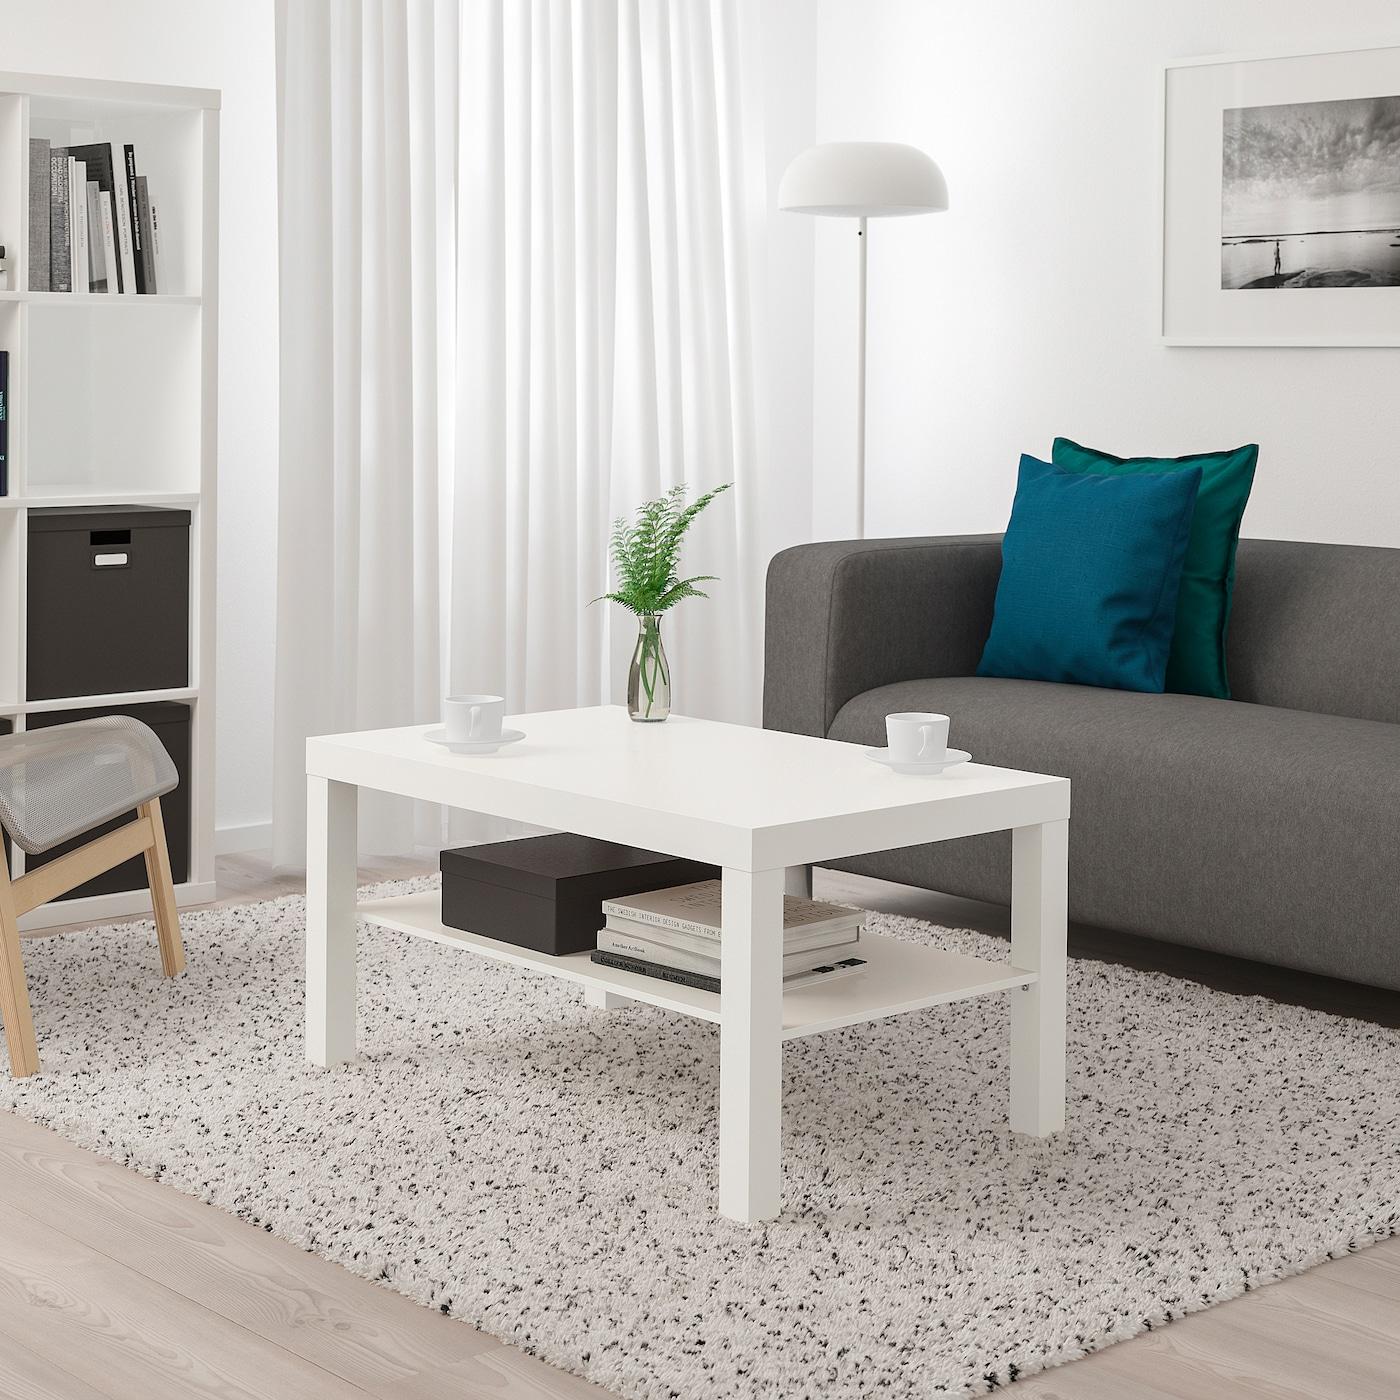 Buy Lack Coffee Table White 90x55 Cm Online Uae Ikea [ 1400 x 1400 Pixel ]